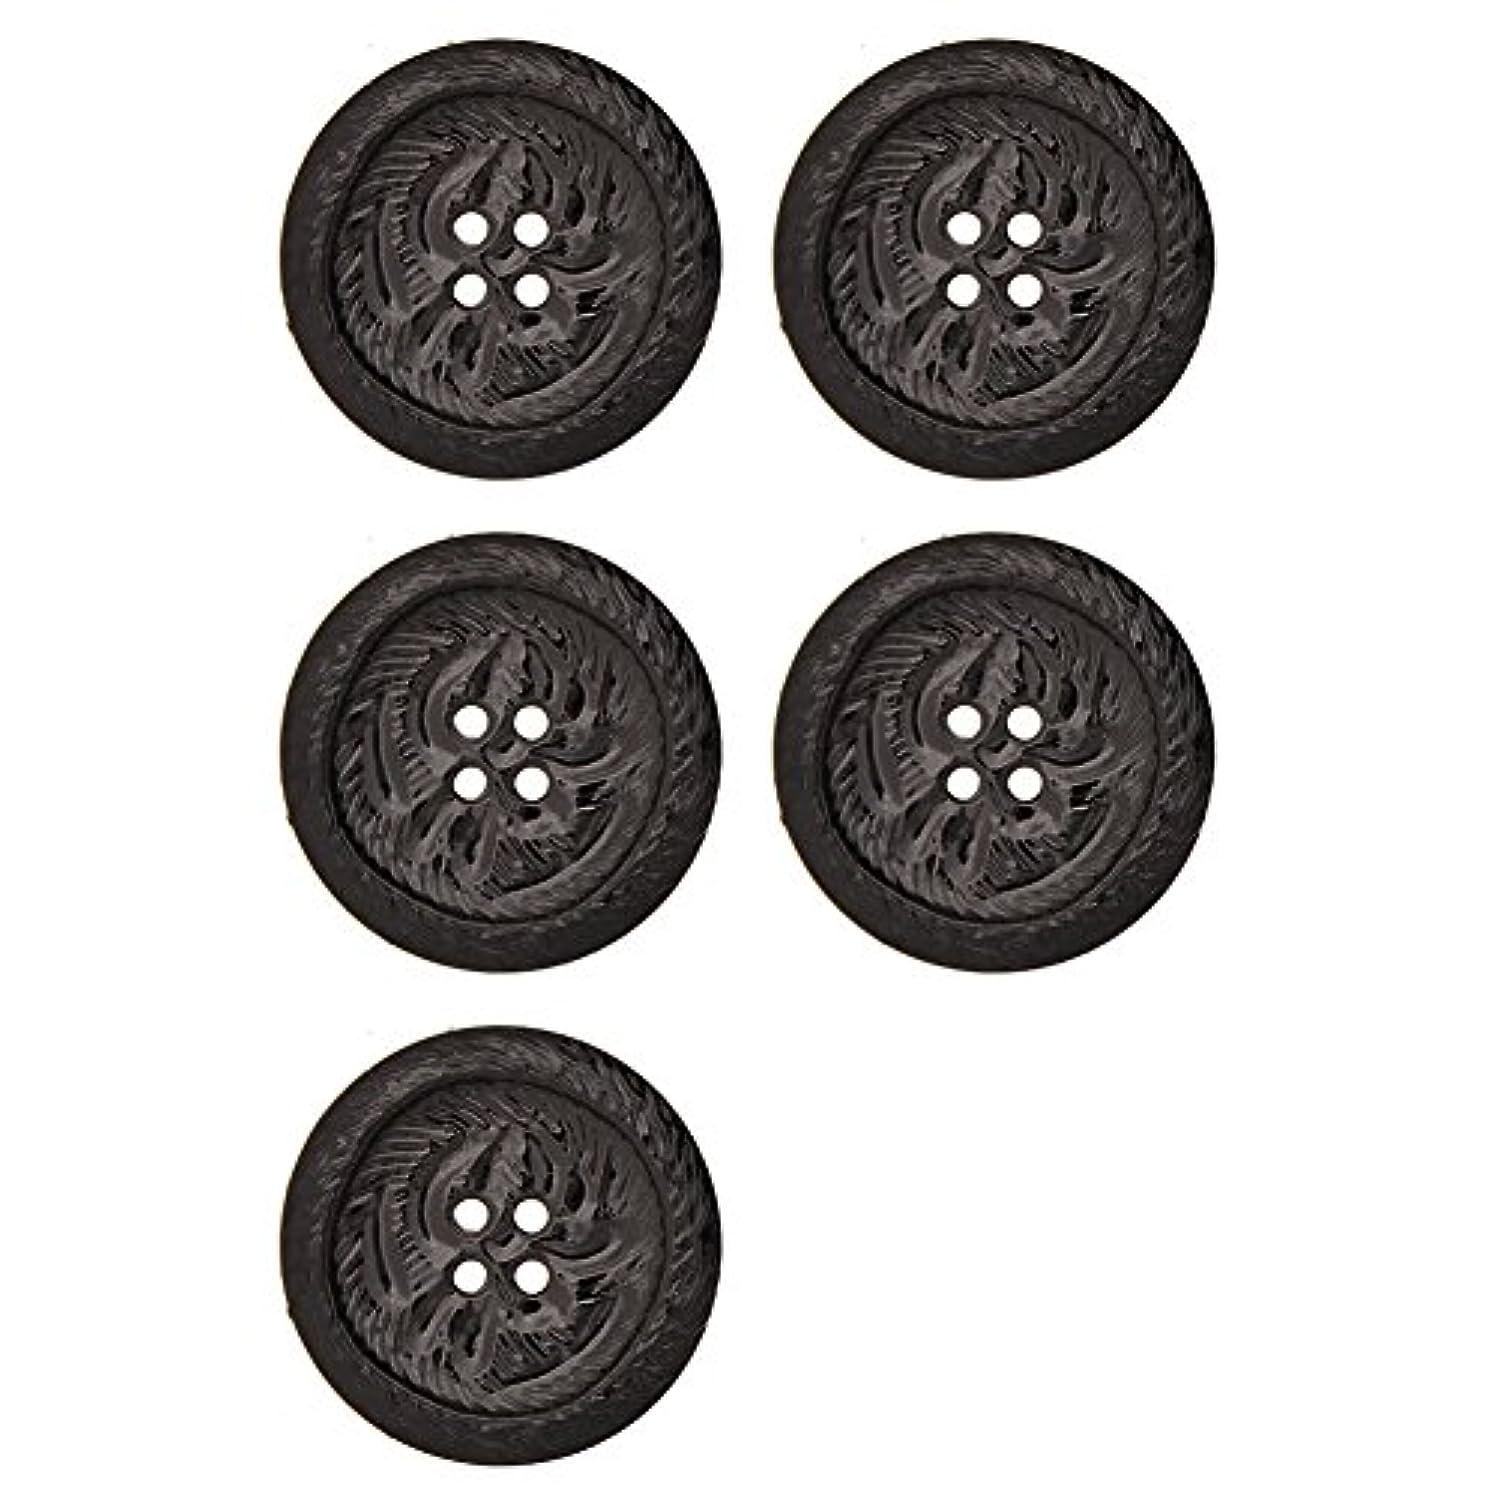 Pearlized Finish Button 4 Hole Jungle Design Imprint 54 Line Black Pearl